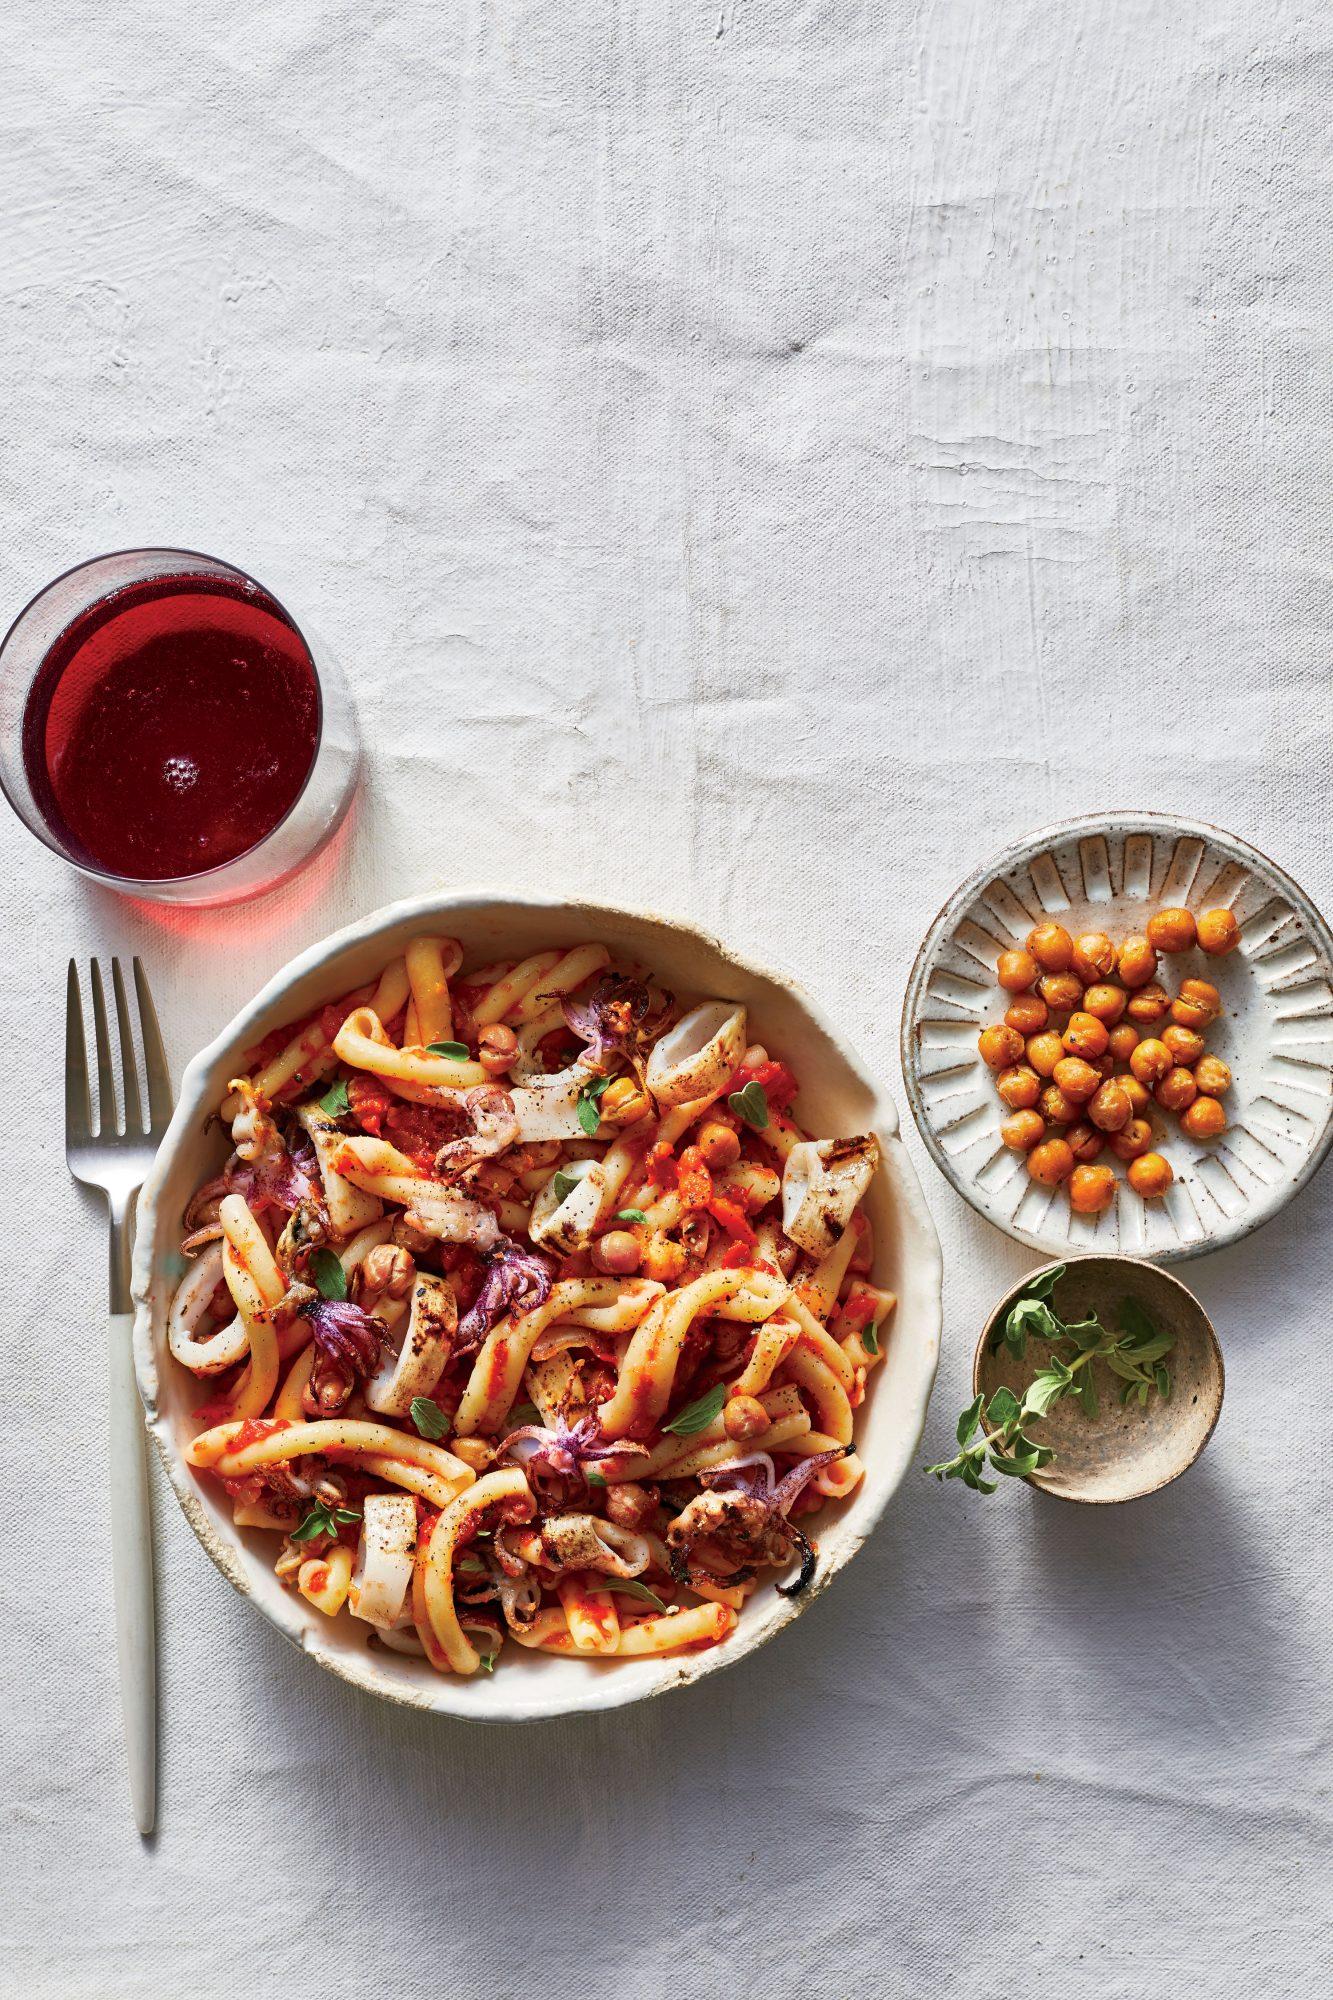 Strozzapreti with Grilled Calamari, Roasted Tomato Sauce, and Crispy Chickpeas